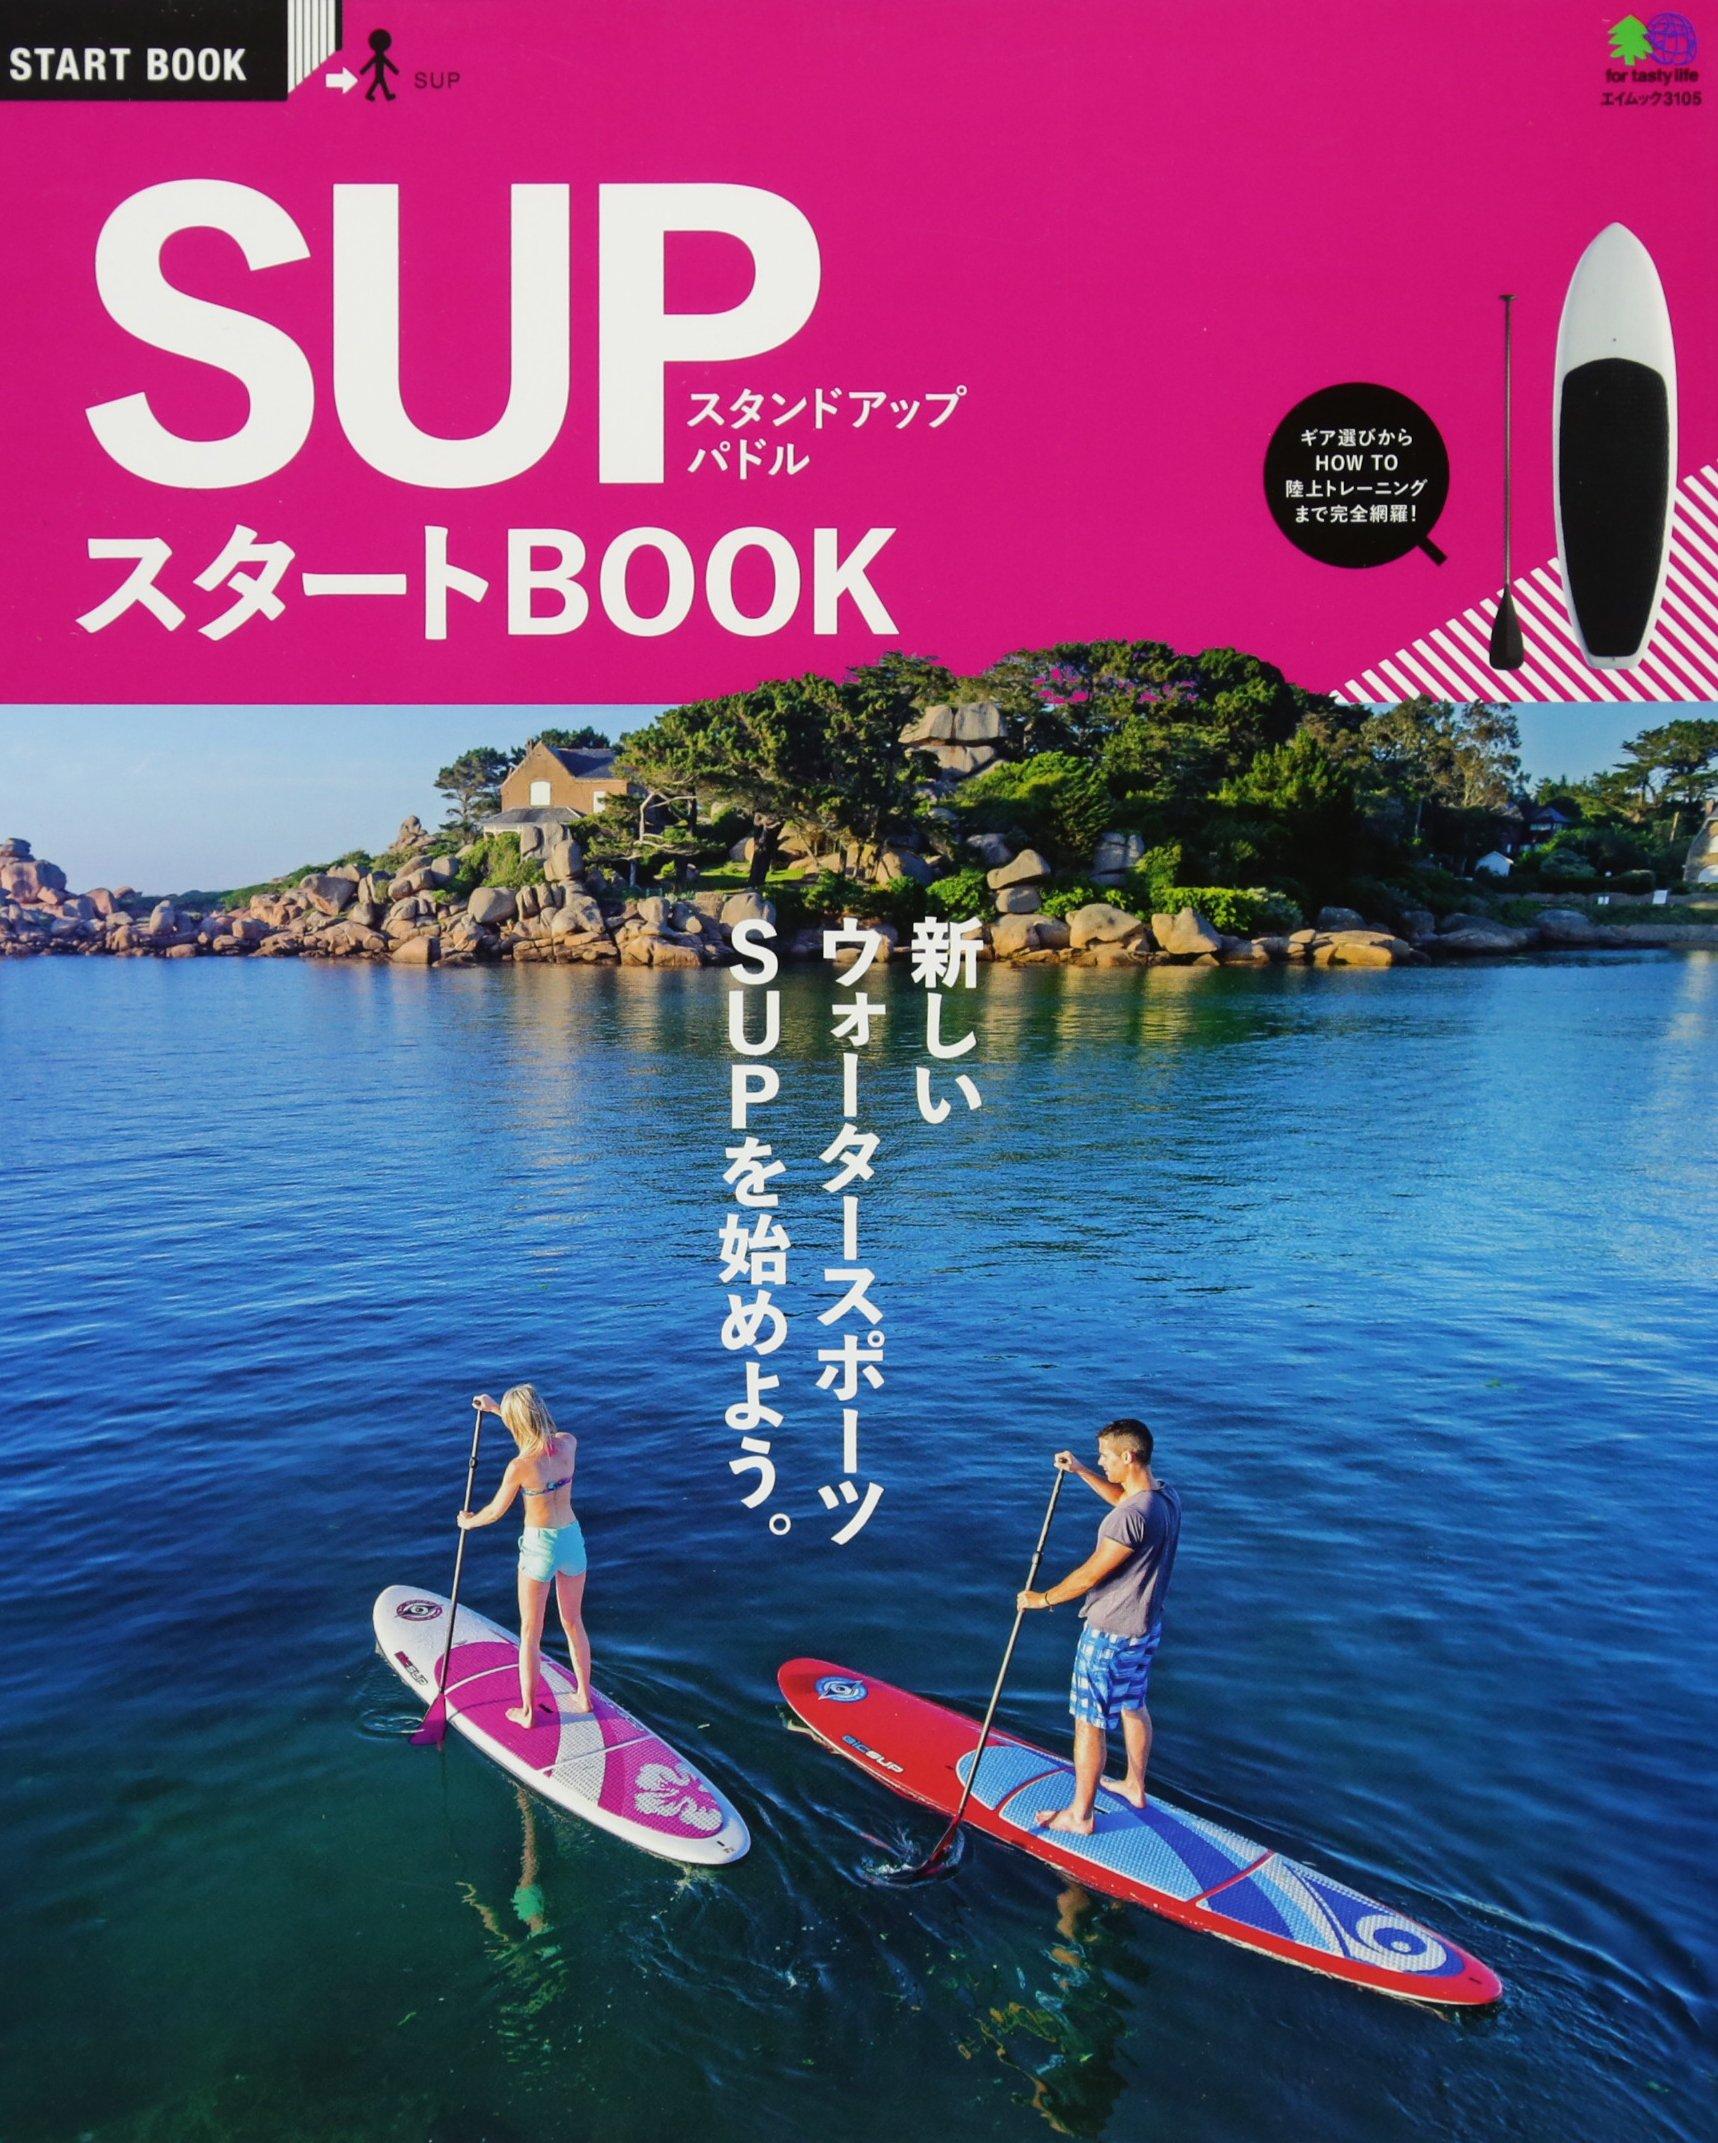 「SUPスタートBOOK」(エイ出版社)